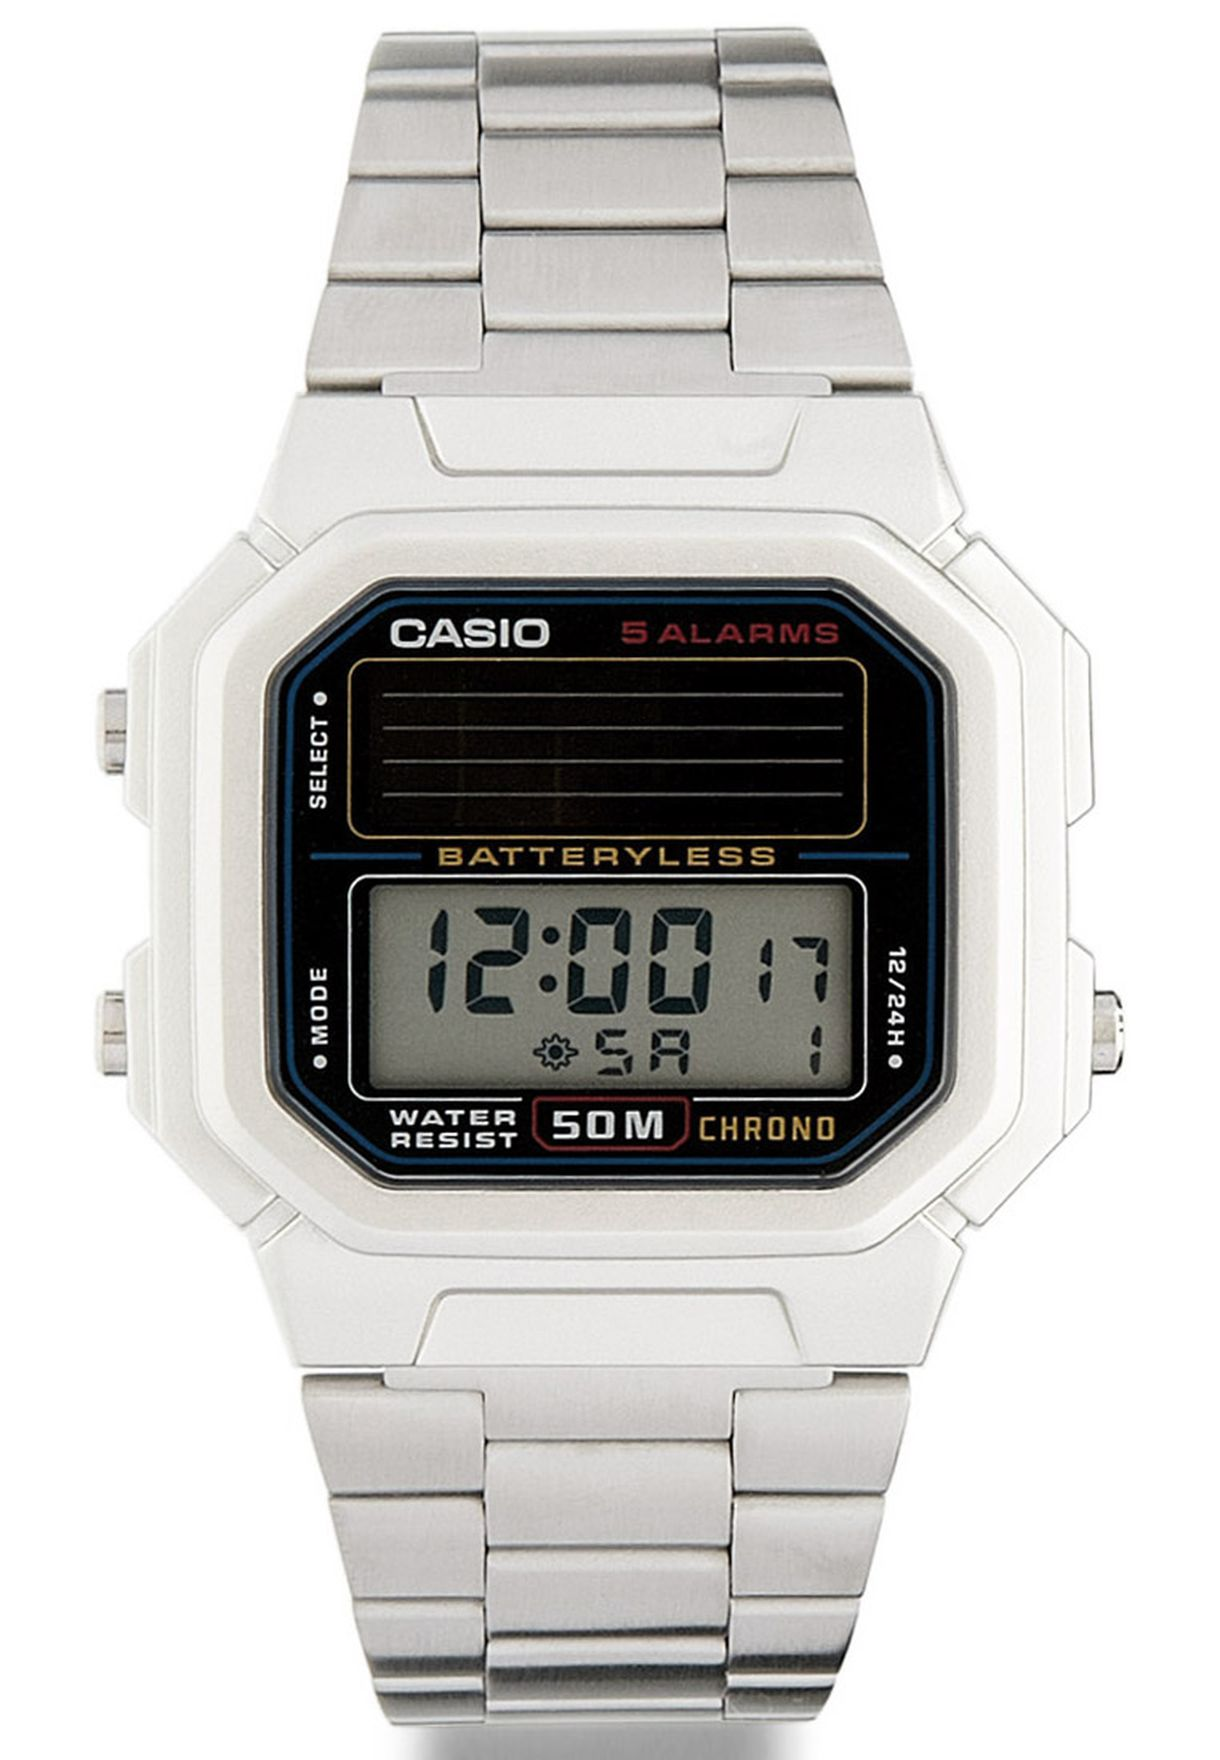 77c142eb5 تسوق ساعة يد ديجيتال ماركة كاسيو لون فضي في الامارات - CA511AC26GDL